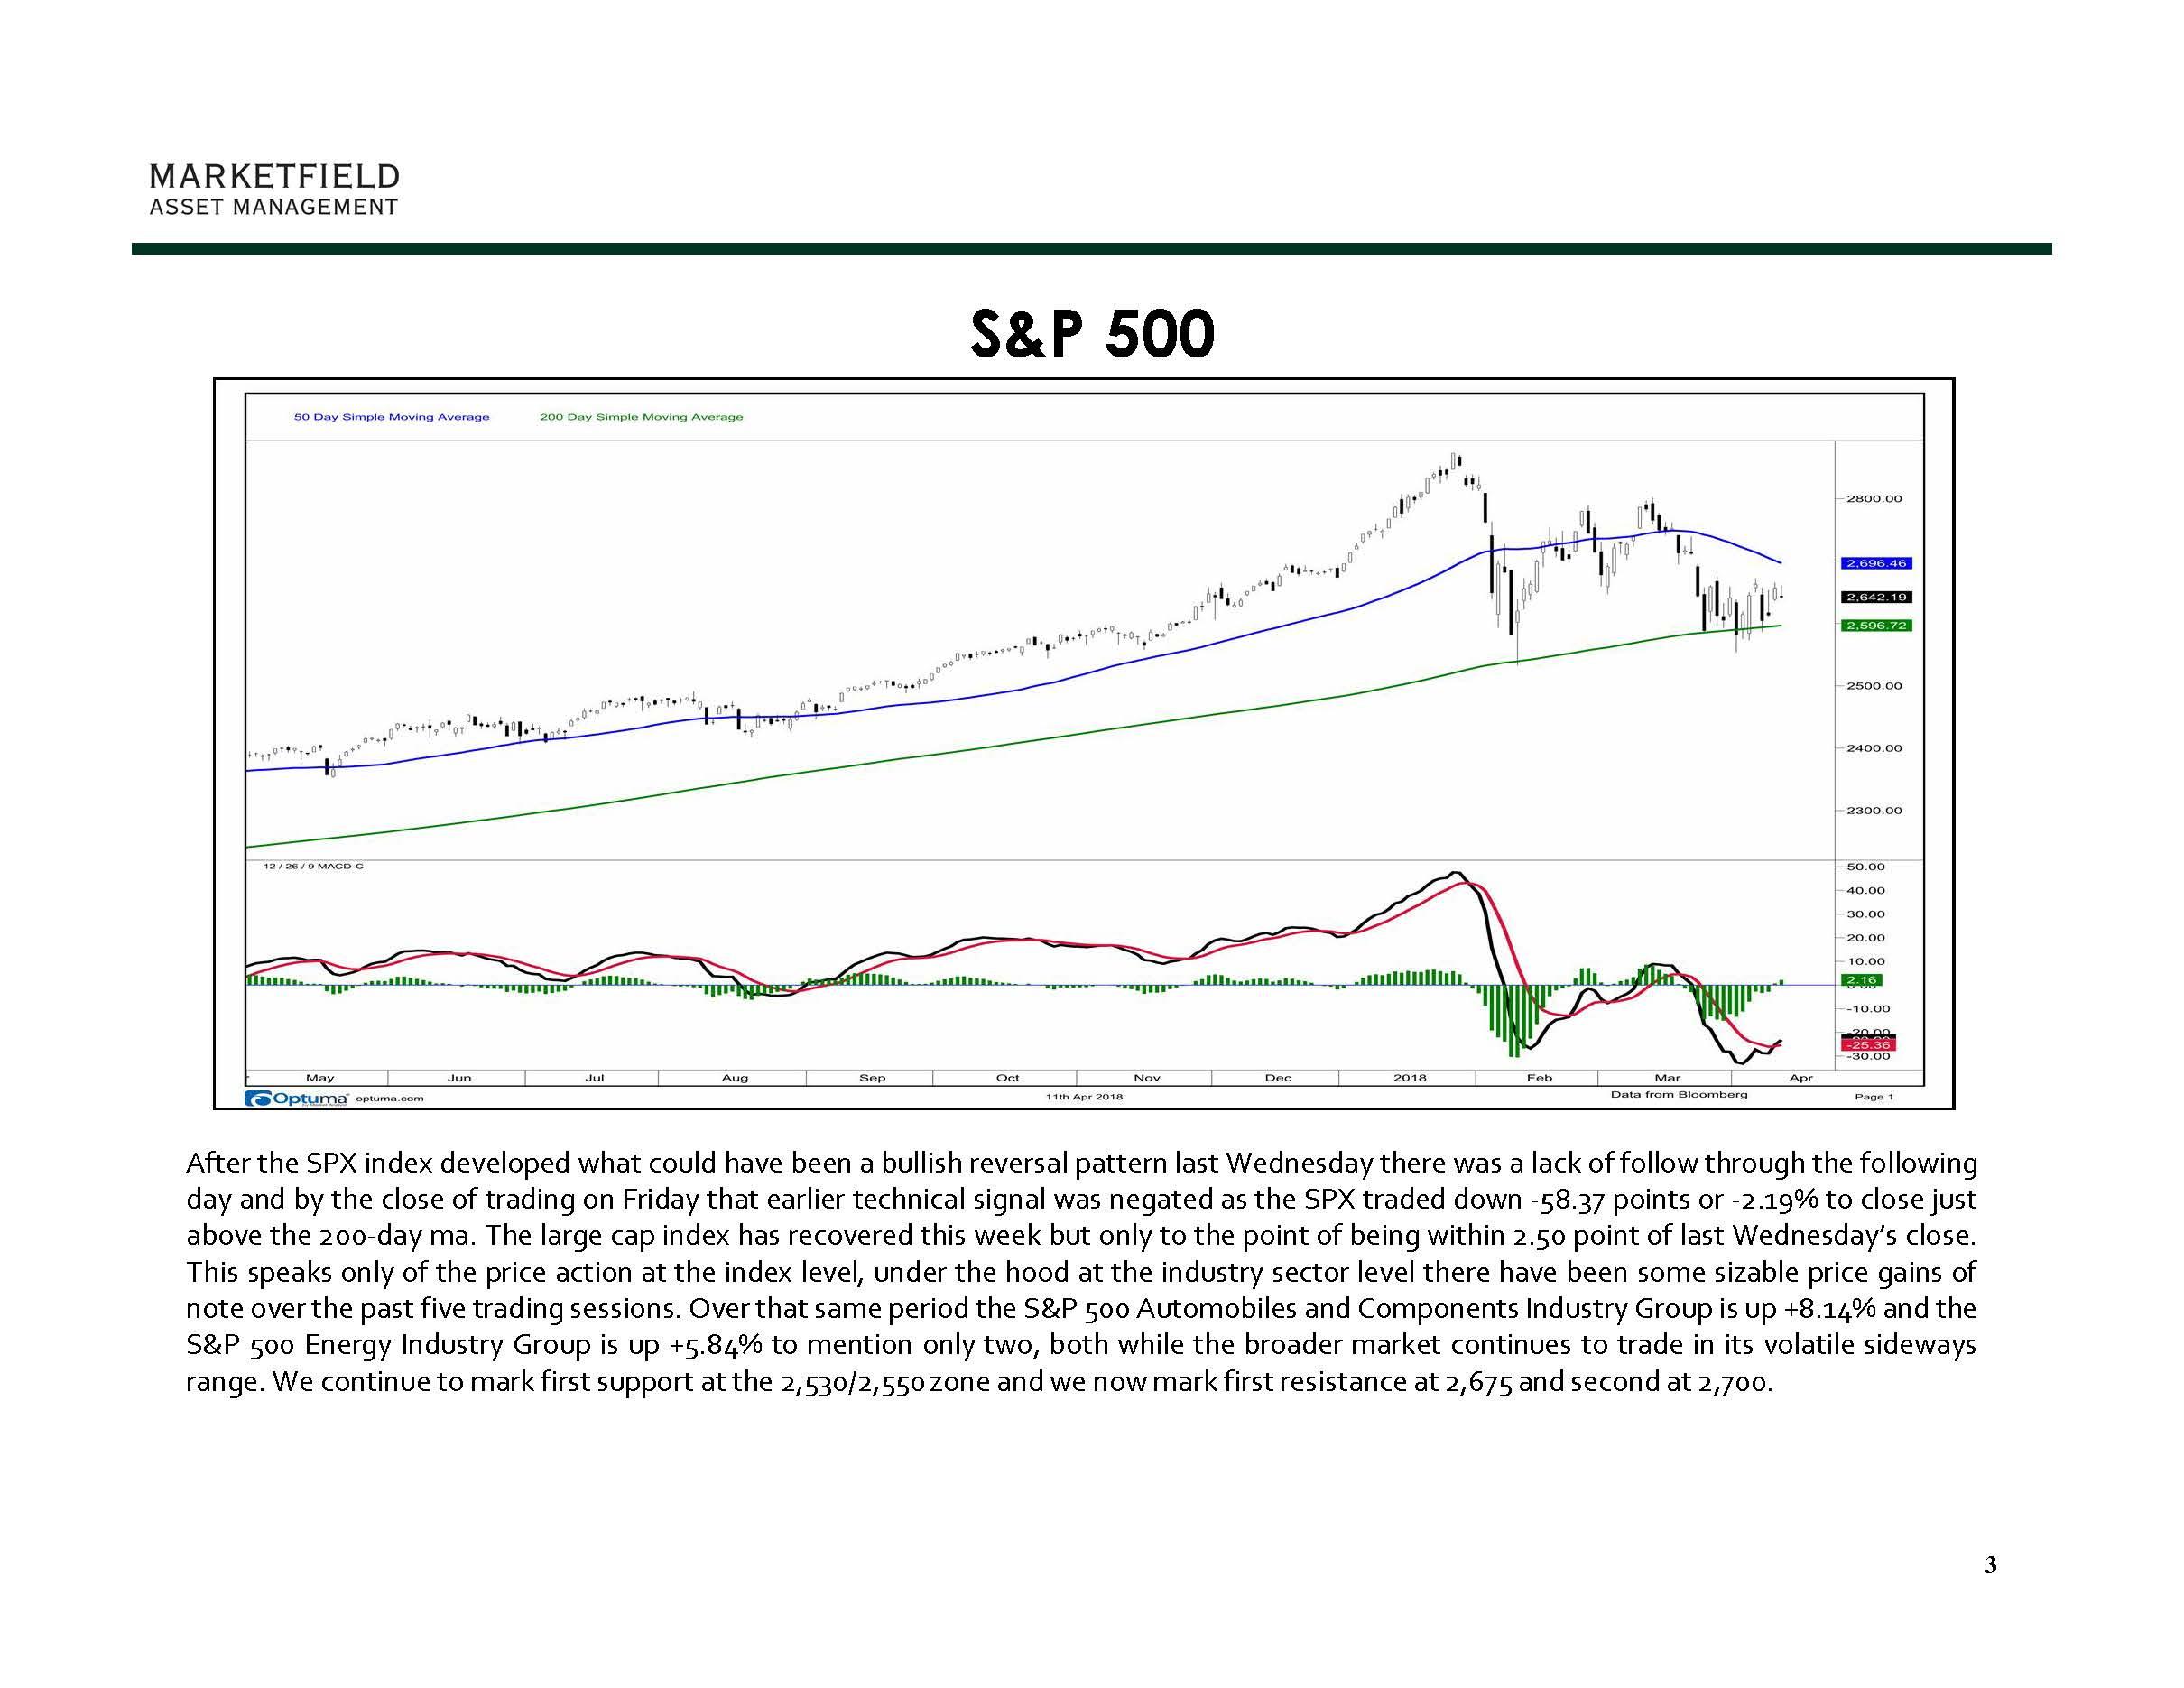 April 12_Marketfield Weekly Speculator_Page_04.jpg